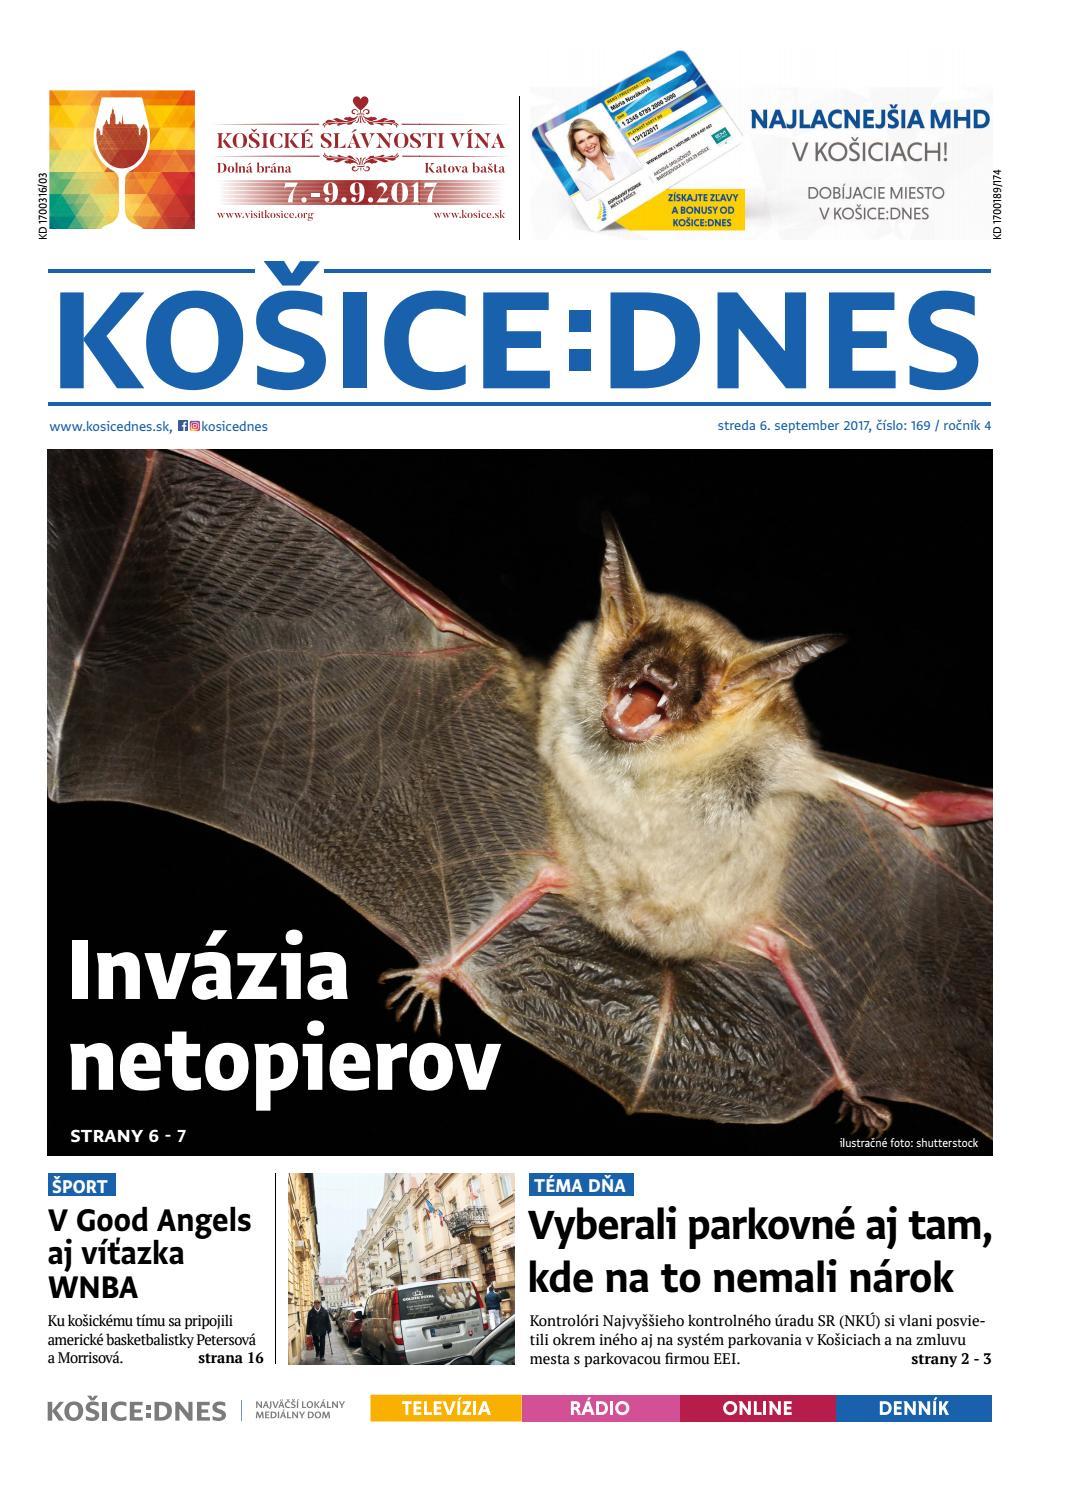 217d5f719 KOŠICE:DNES 6.9.2017 by KOŠICE:DNES - issuu